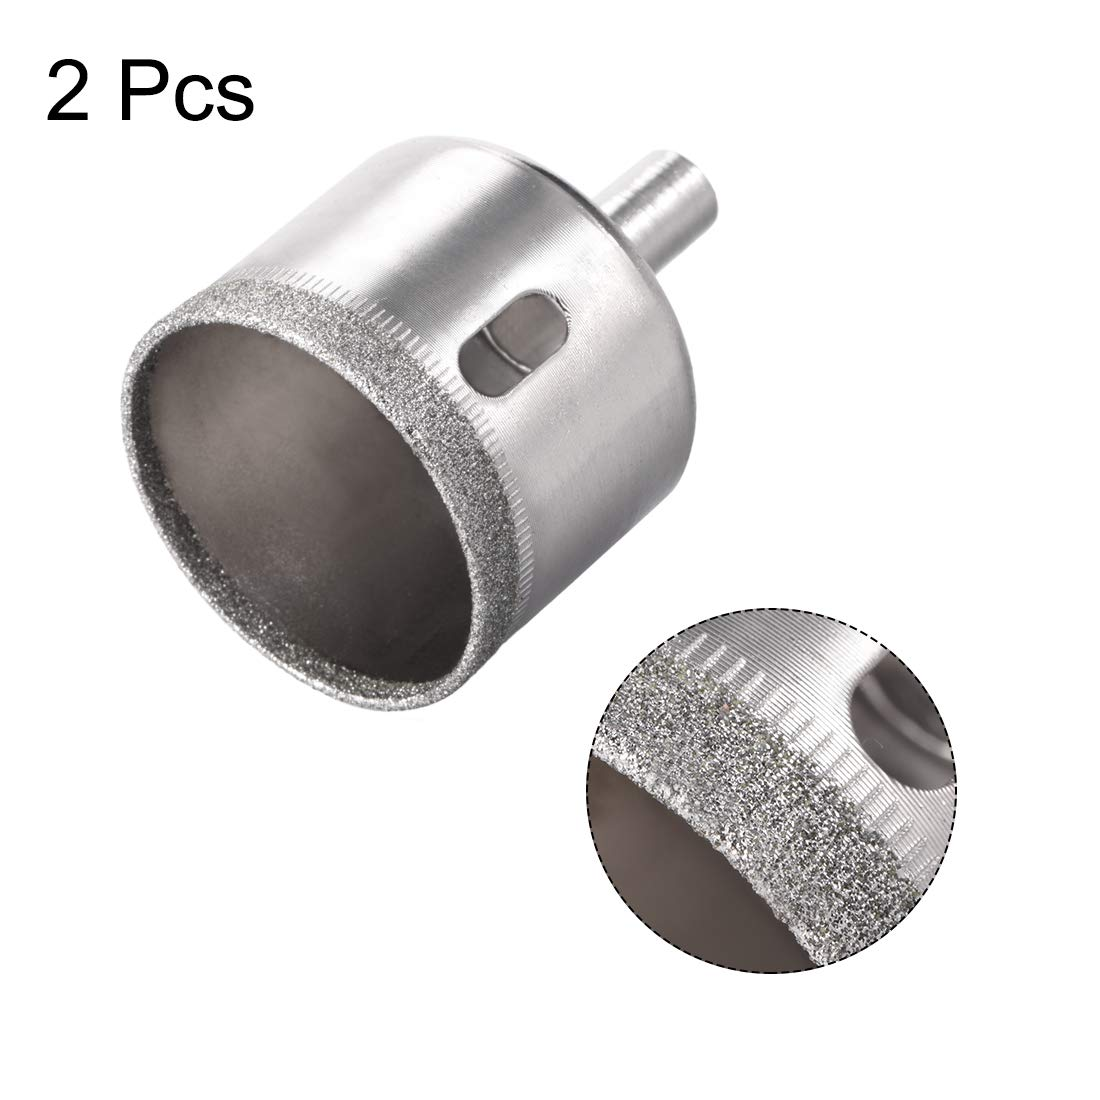 sourcing map taladro metal de diamante de 26 mm para sierras perforadoras de porcelana vitrocer/ámica 5 piezas